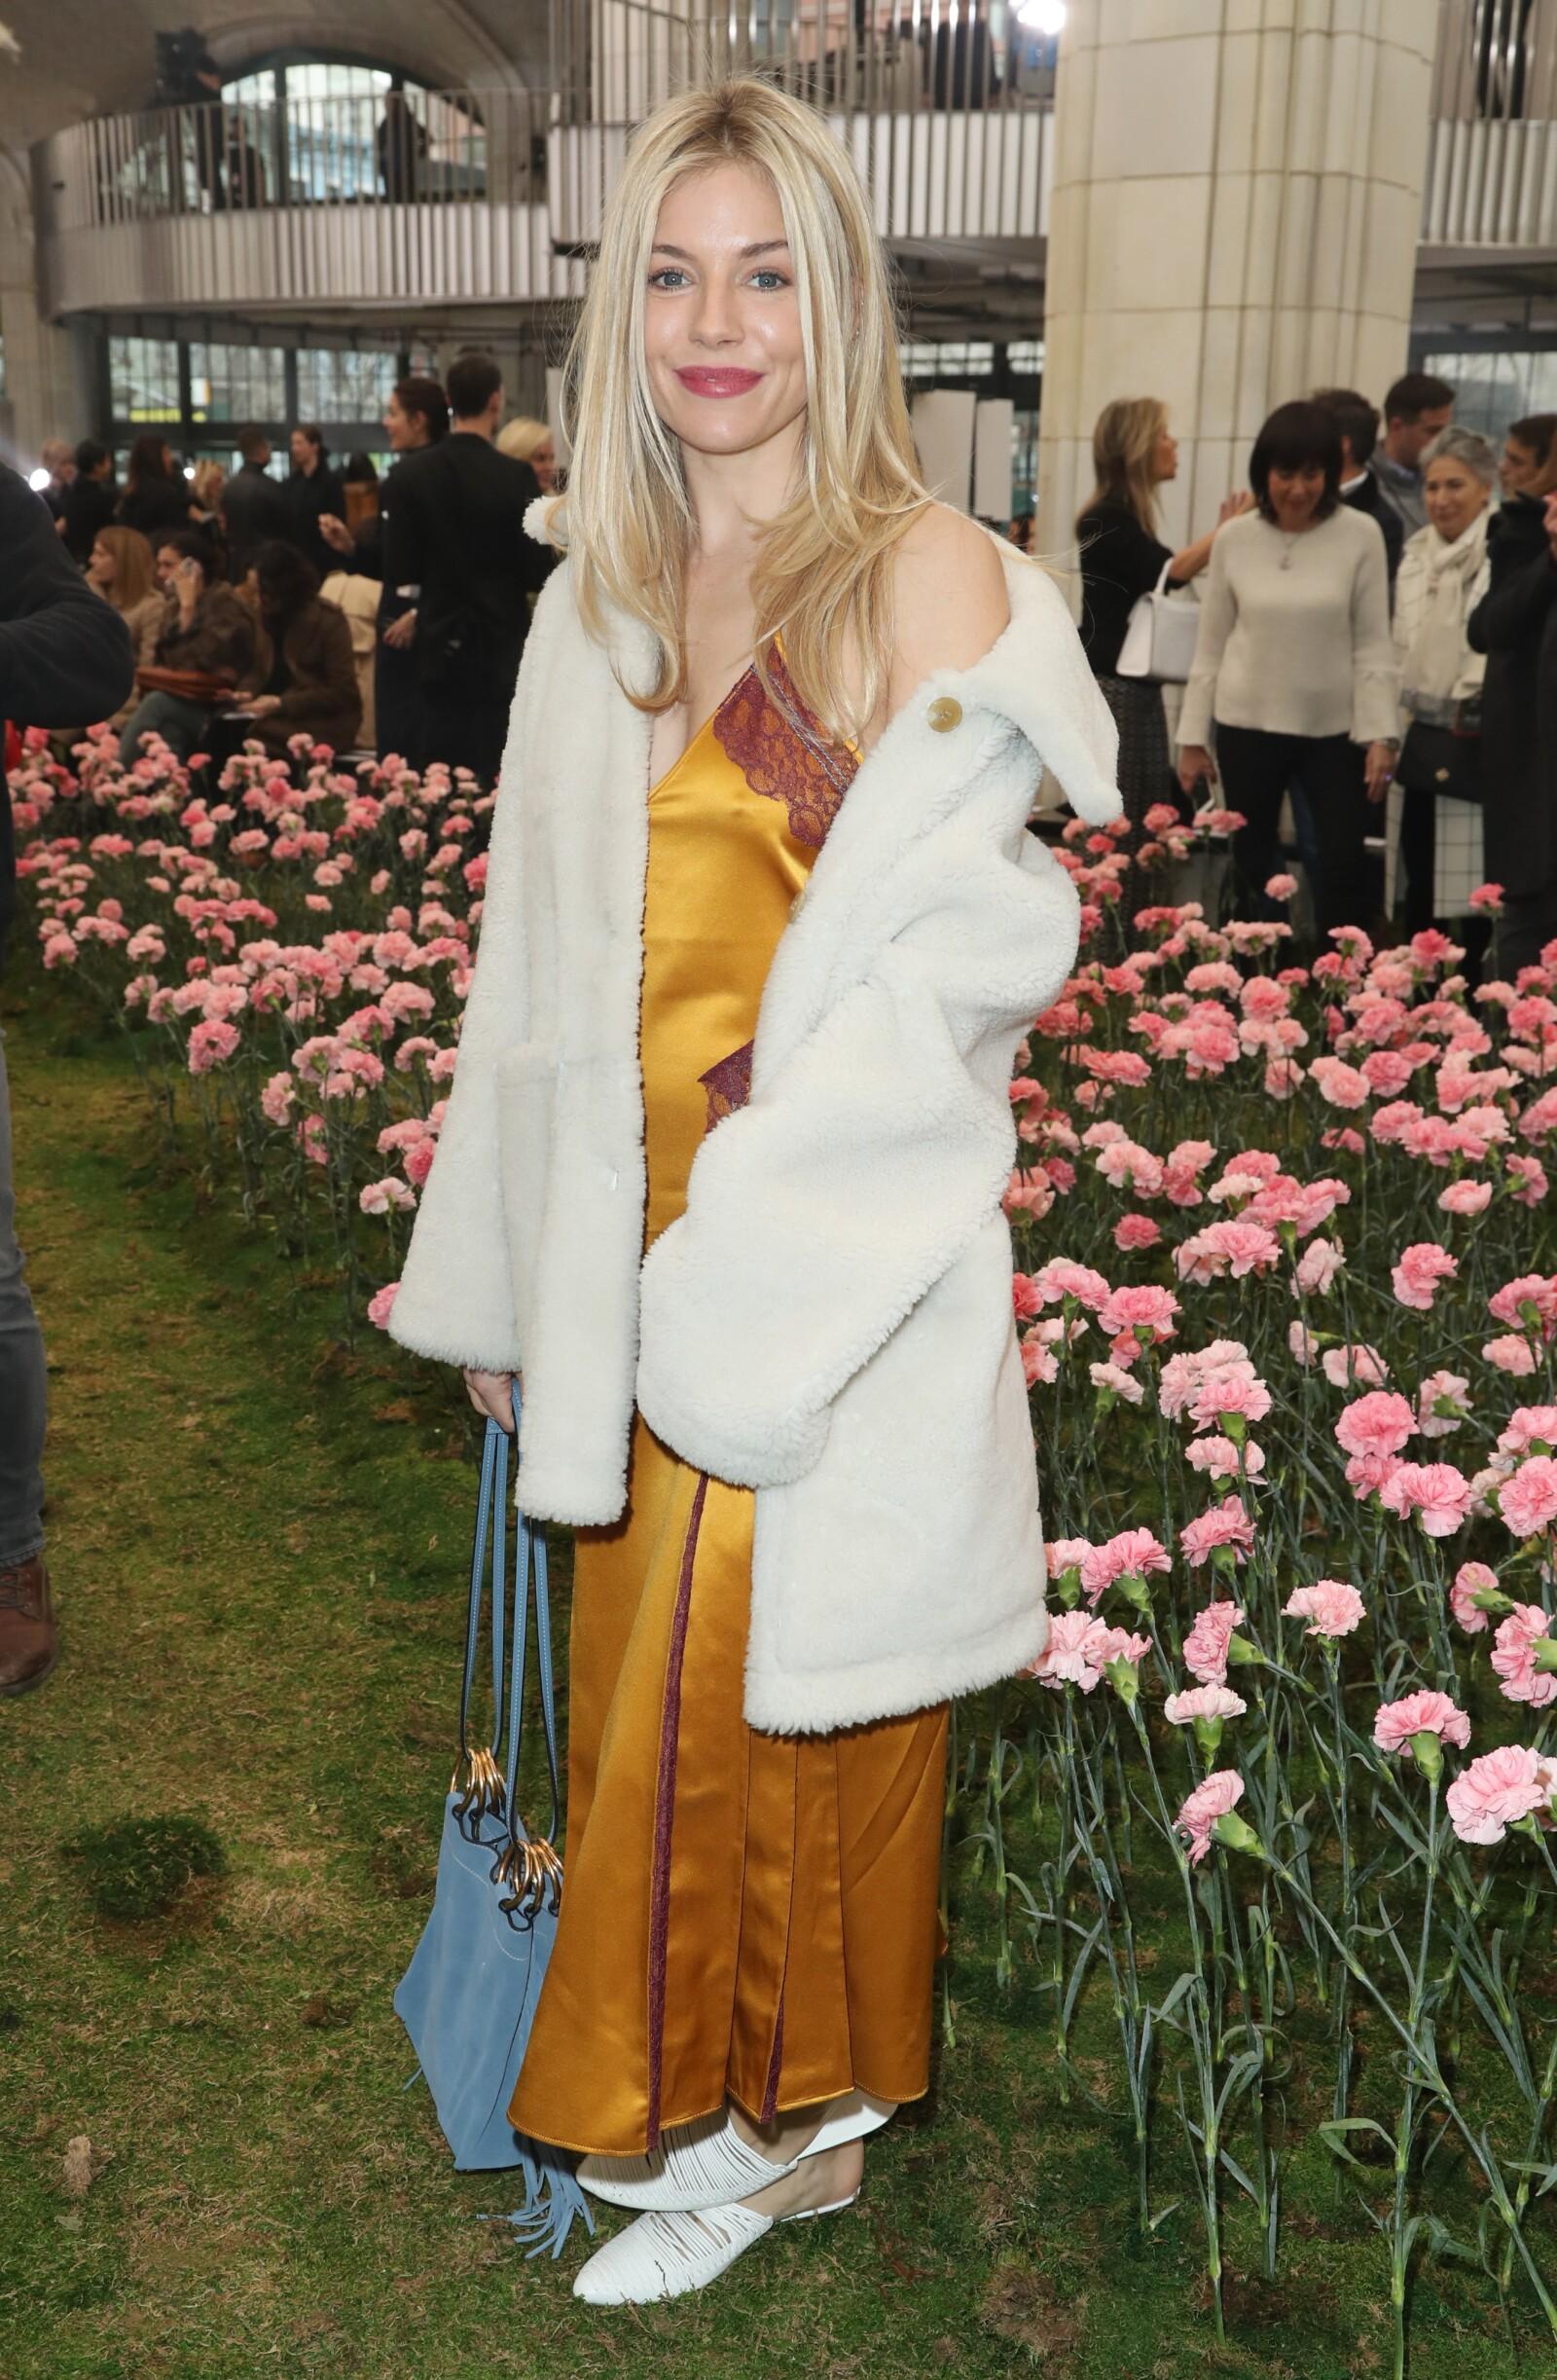 Tory Burch front row, Fall Winter 2018, New York Fashion Week, USA - 09 Feb 2018